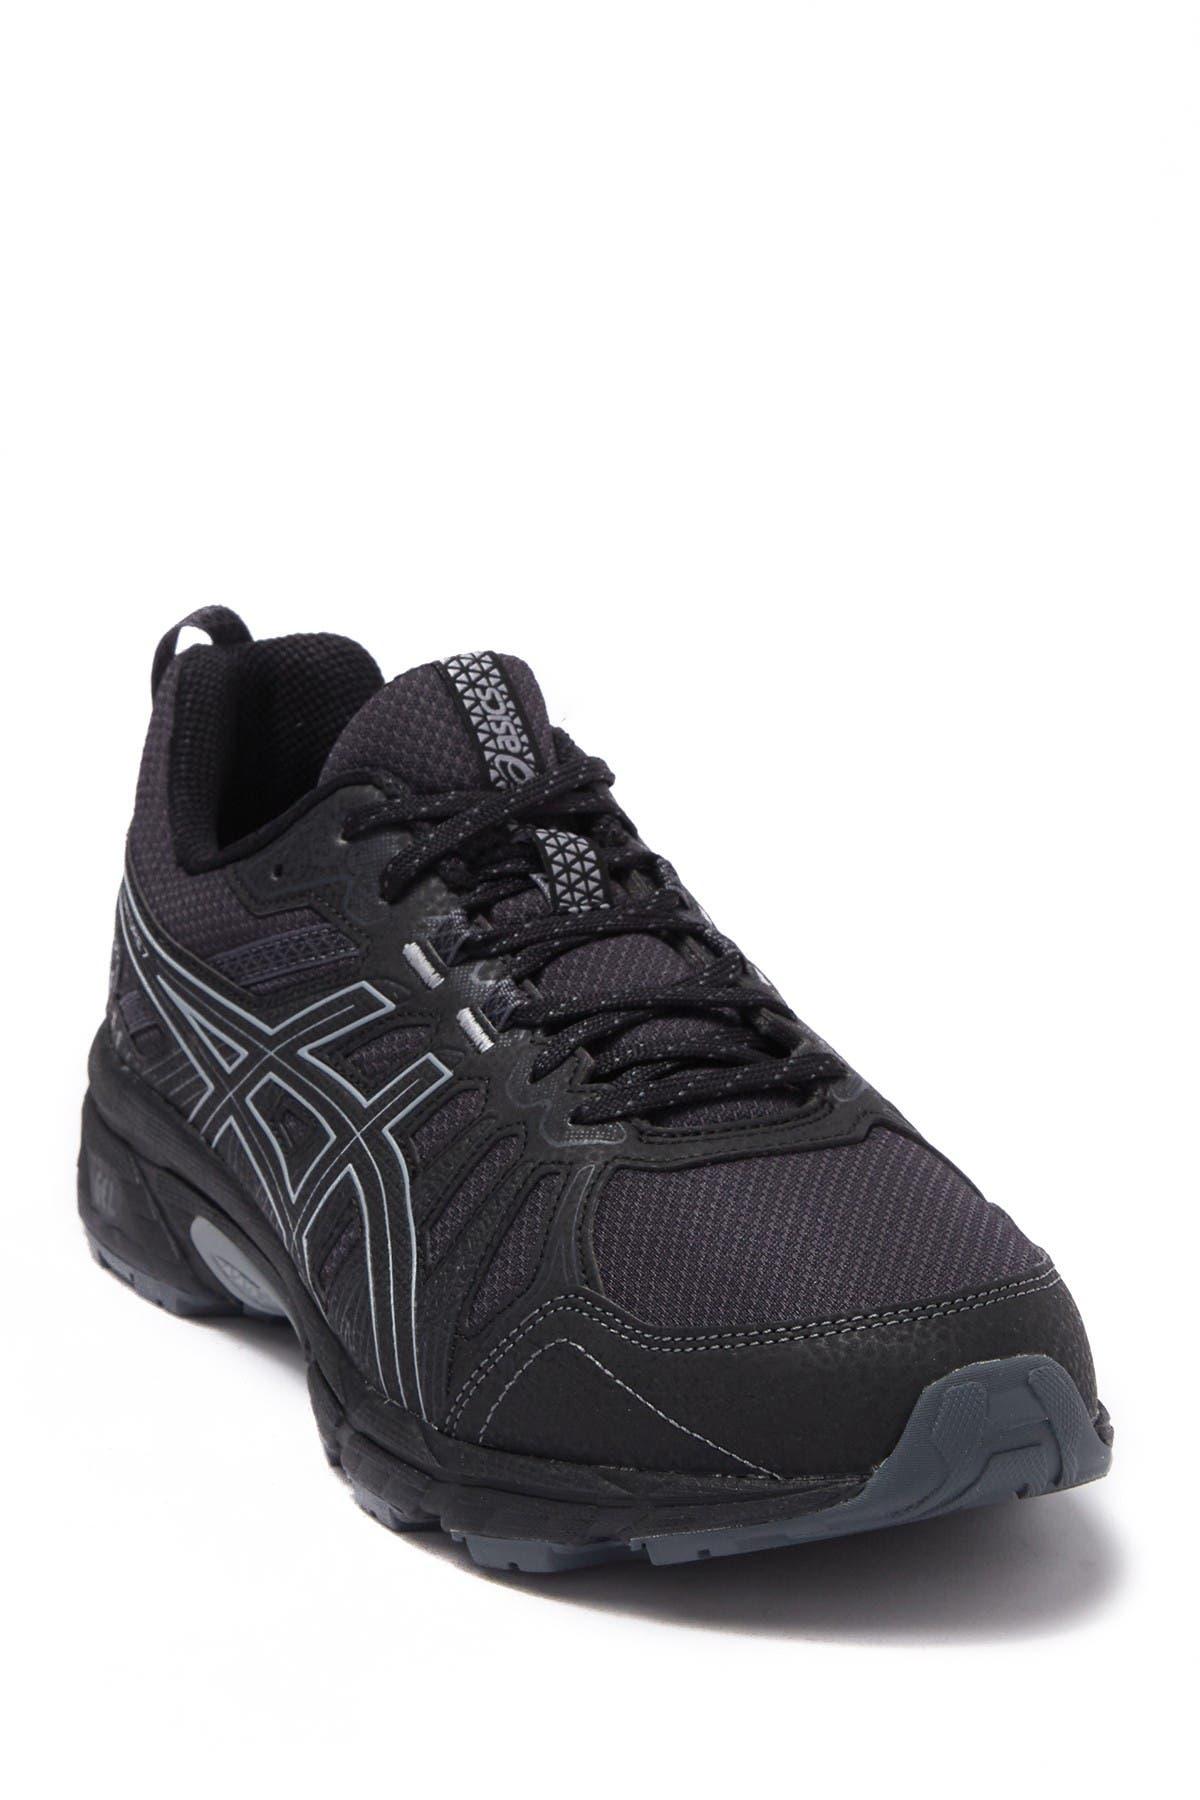 Image of ASICS GEL-Venture 7 Running Sneaker